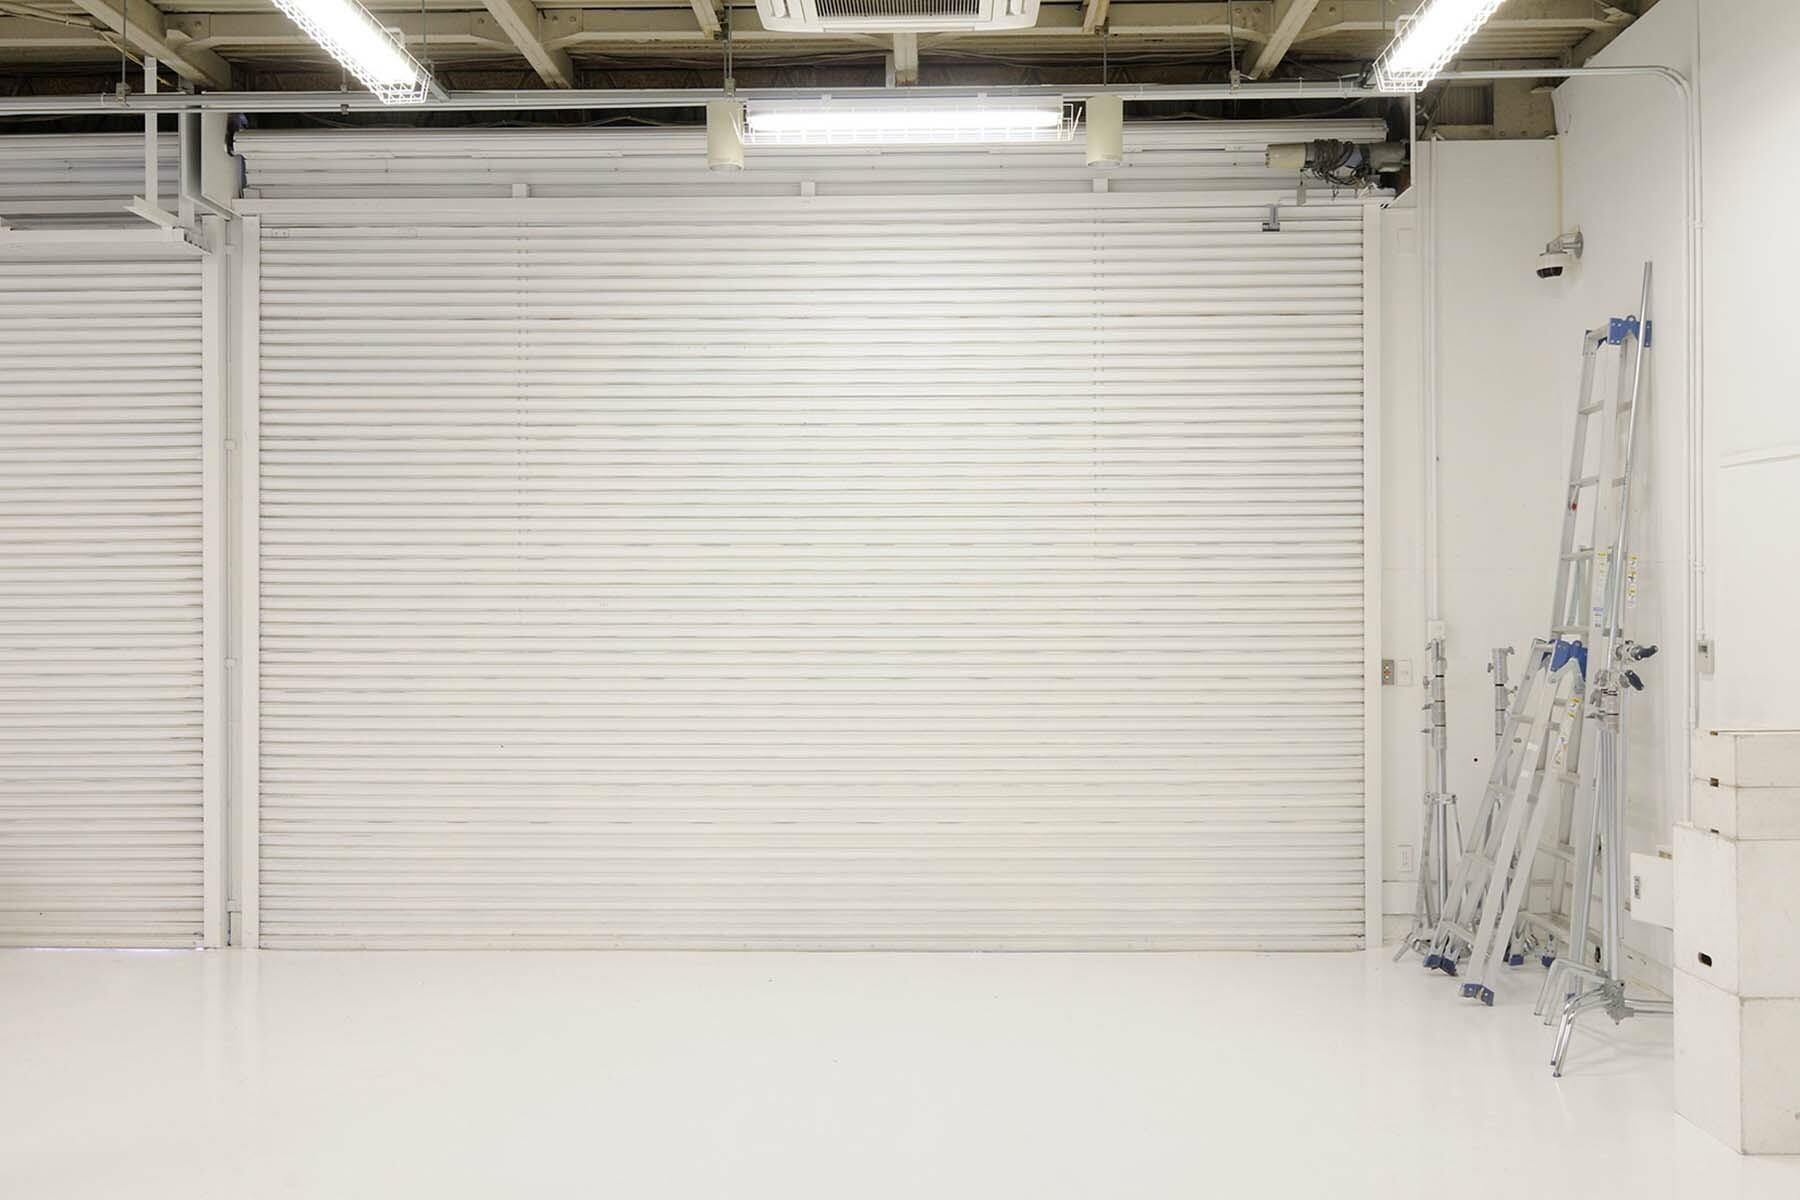 HOXTON STUDIO Loft/Garage (ホクストンスタジオ ロフト/ガレージ)Garage(1F)